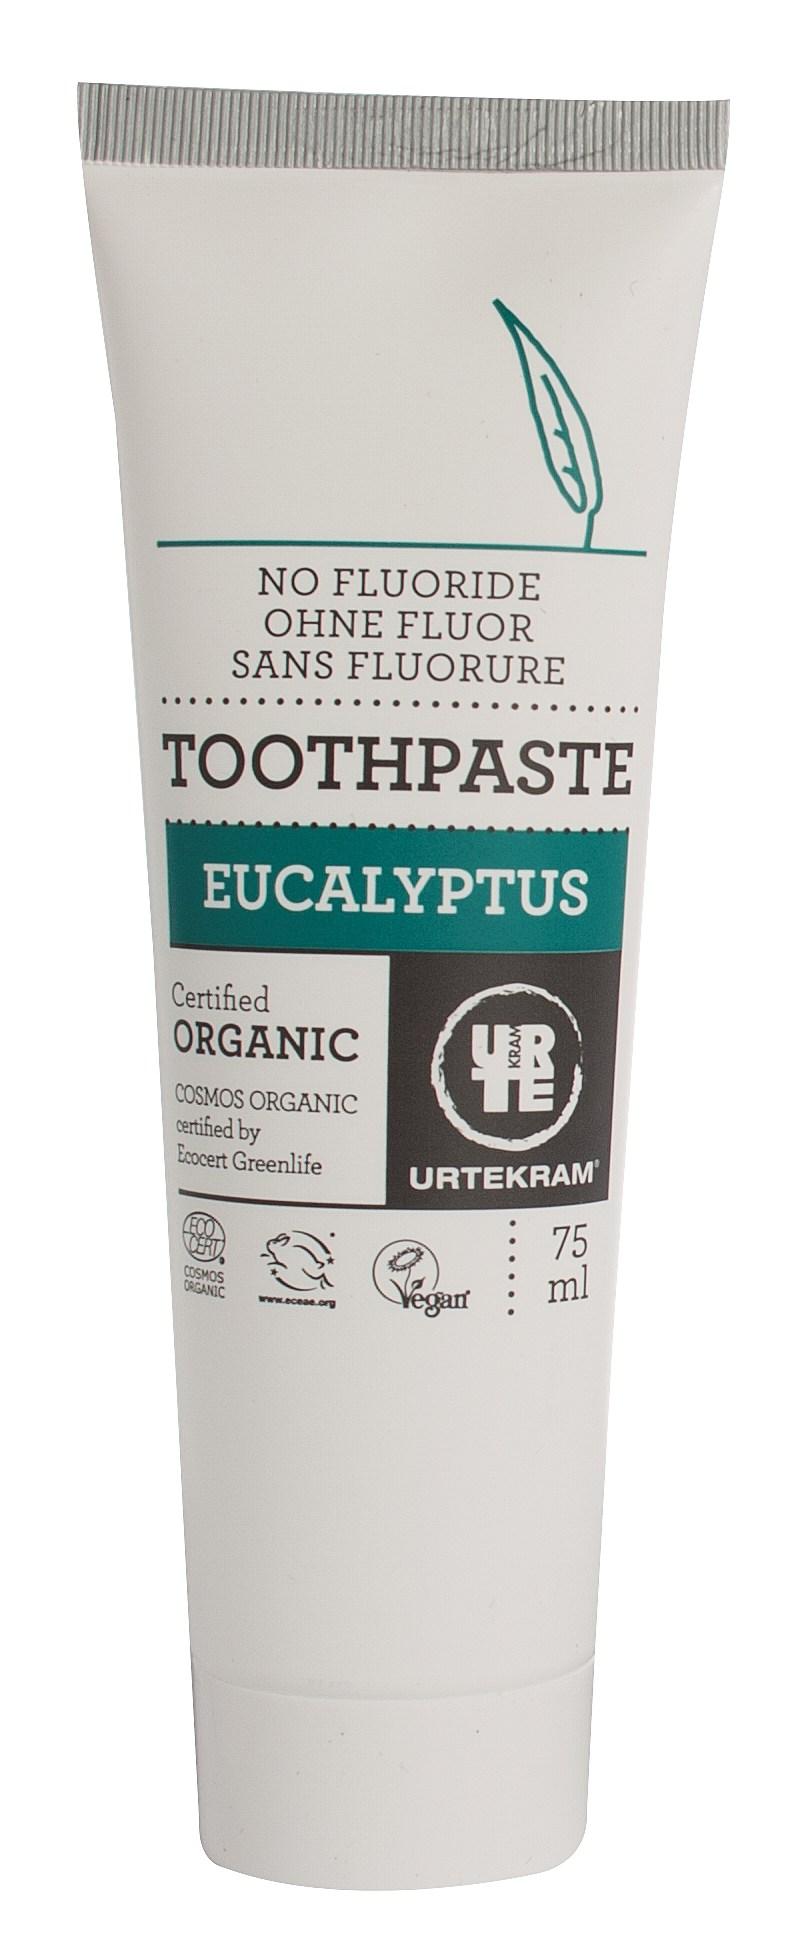 Urtekram Tandpasta Eucalyptus - 75 ml